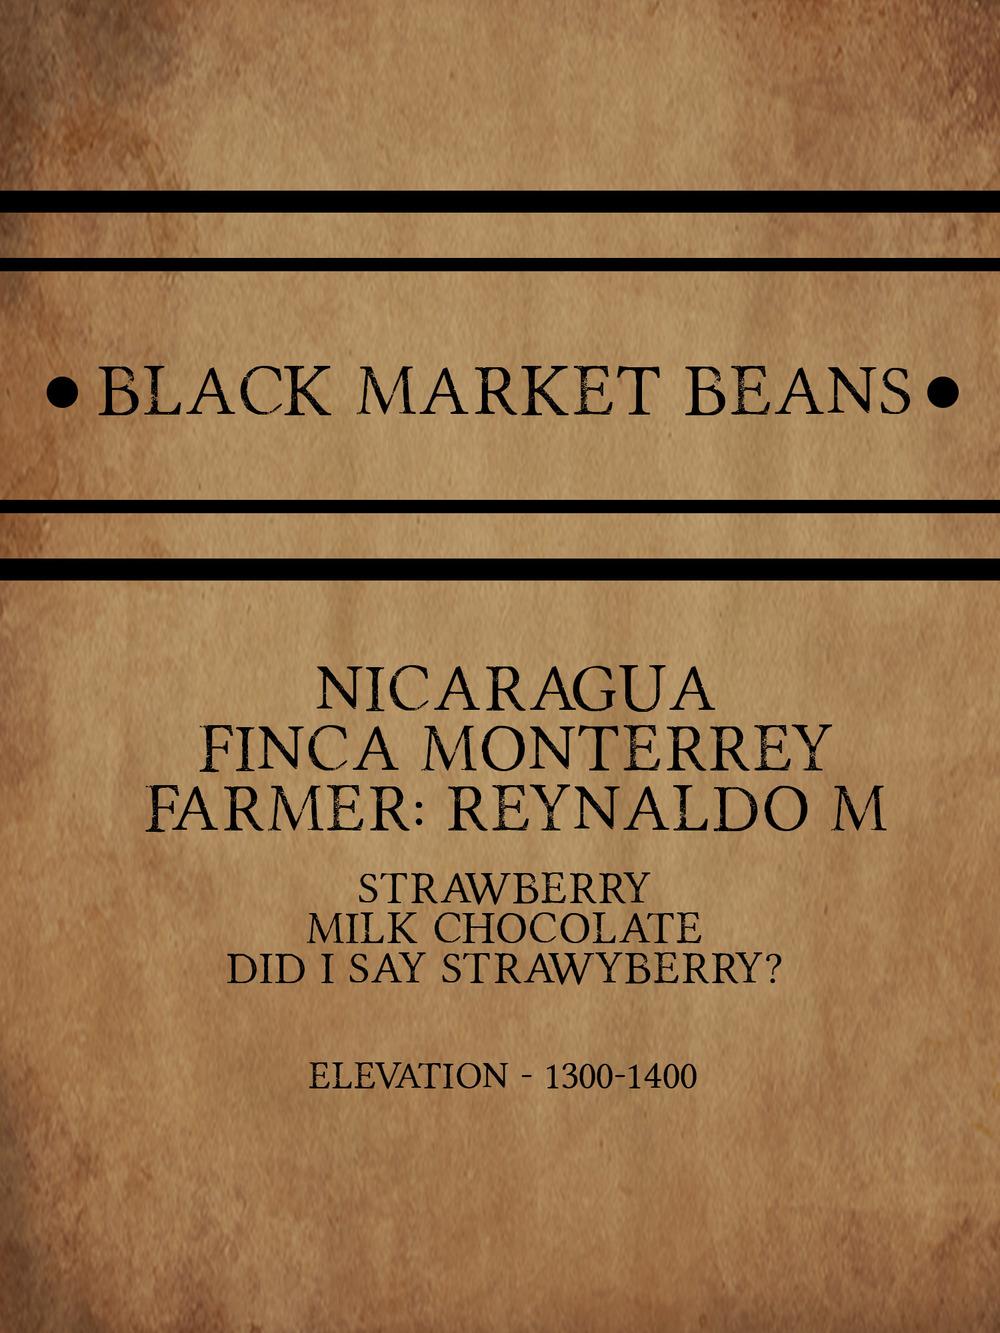 coffee_Nicaragua_finca_Monterrey_farm.jpg